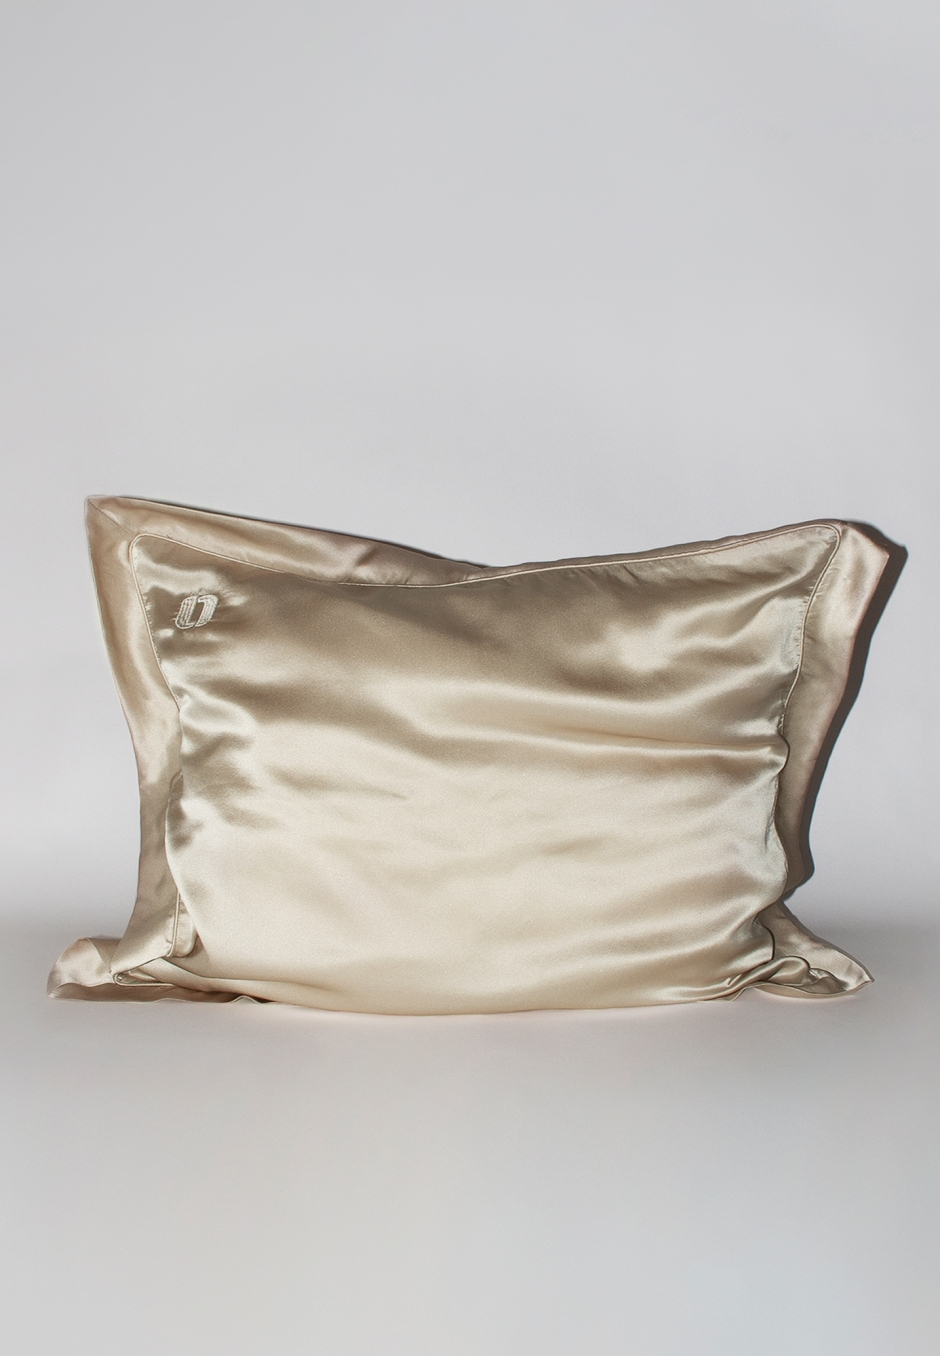 Our New Routine Silk Pillowcase - 005 Golden Hour